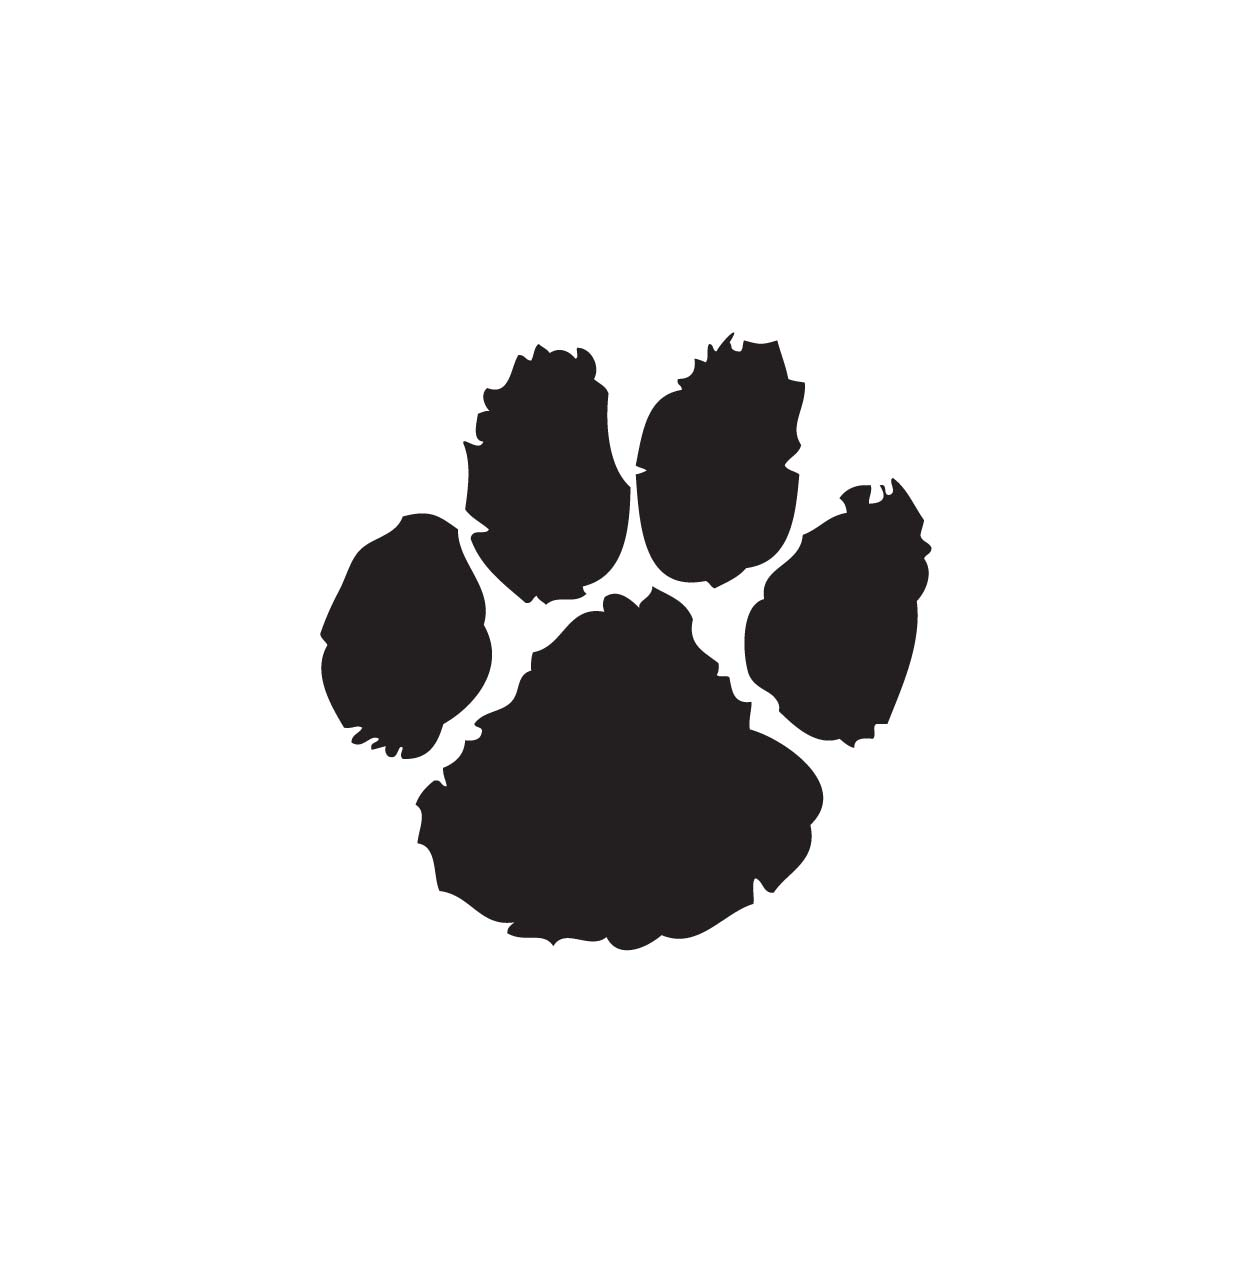 Green Dog Paw Clip Art Clipart Panda Fre-Green Dog Paw Clip Art Clipart Panda Free Clipart Images-13